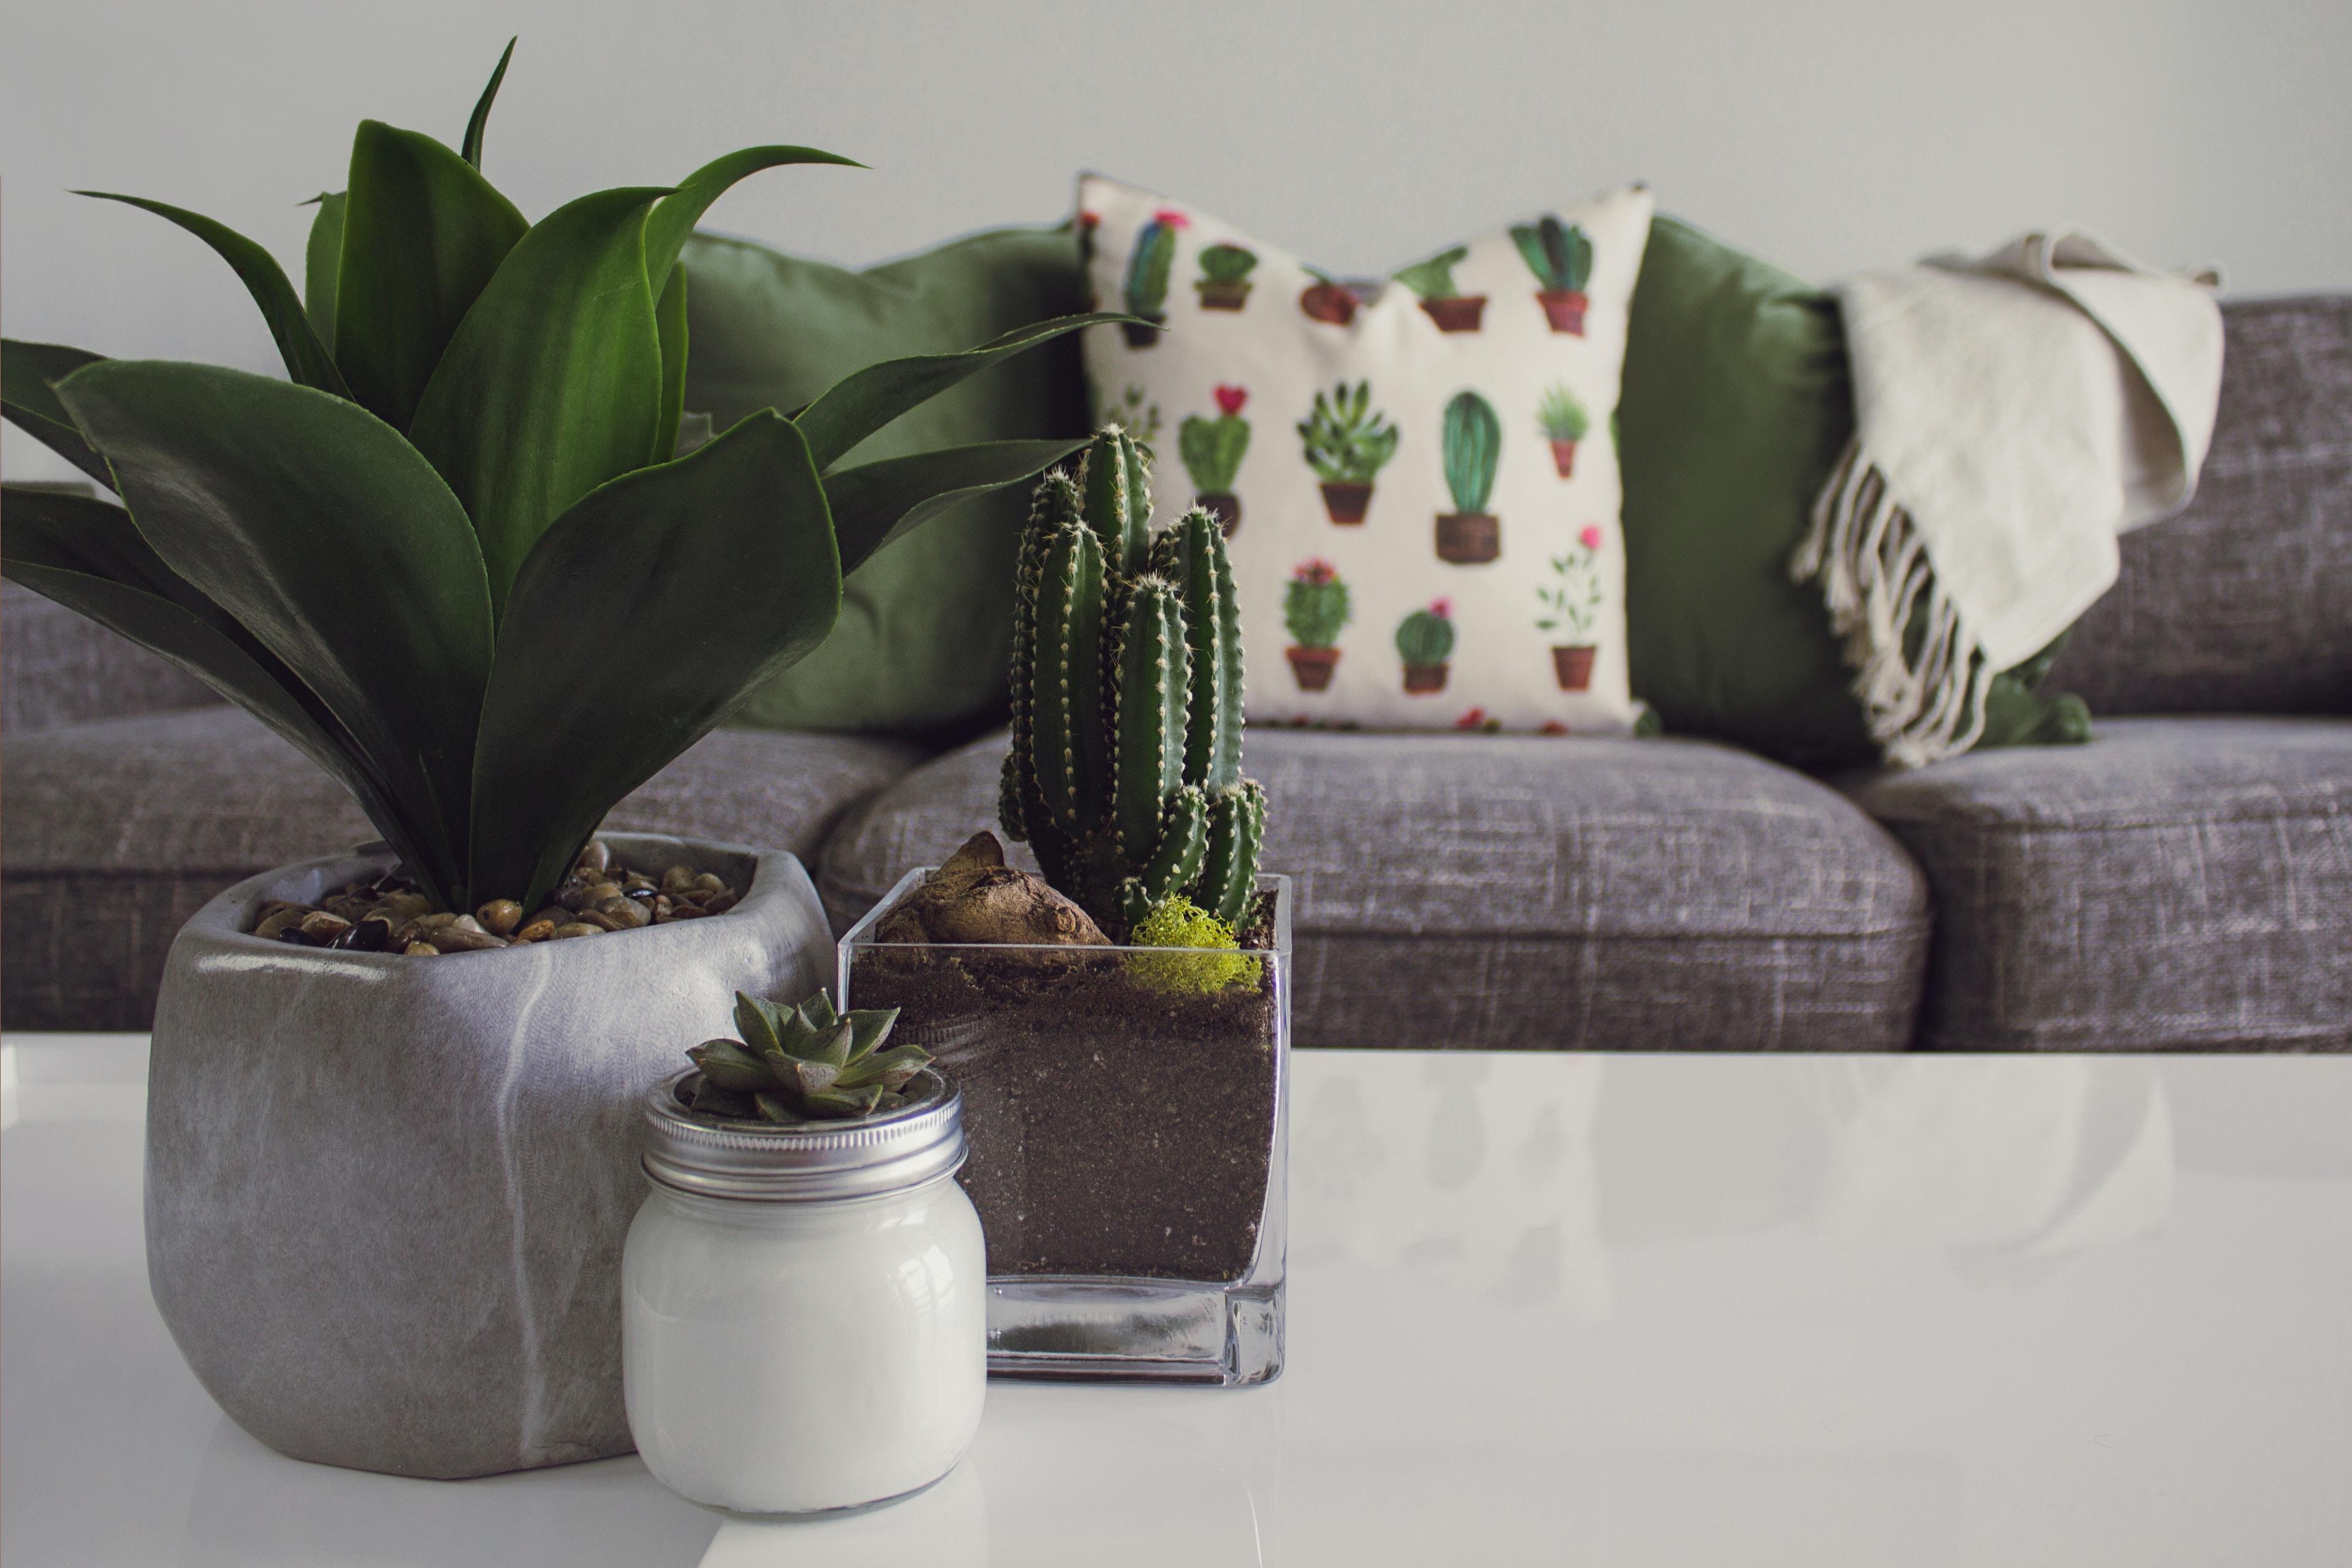 Charmant English U0026 Company. . Nashvilleu0027s Premier Home Furniture Consignment Store